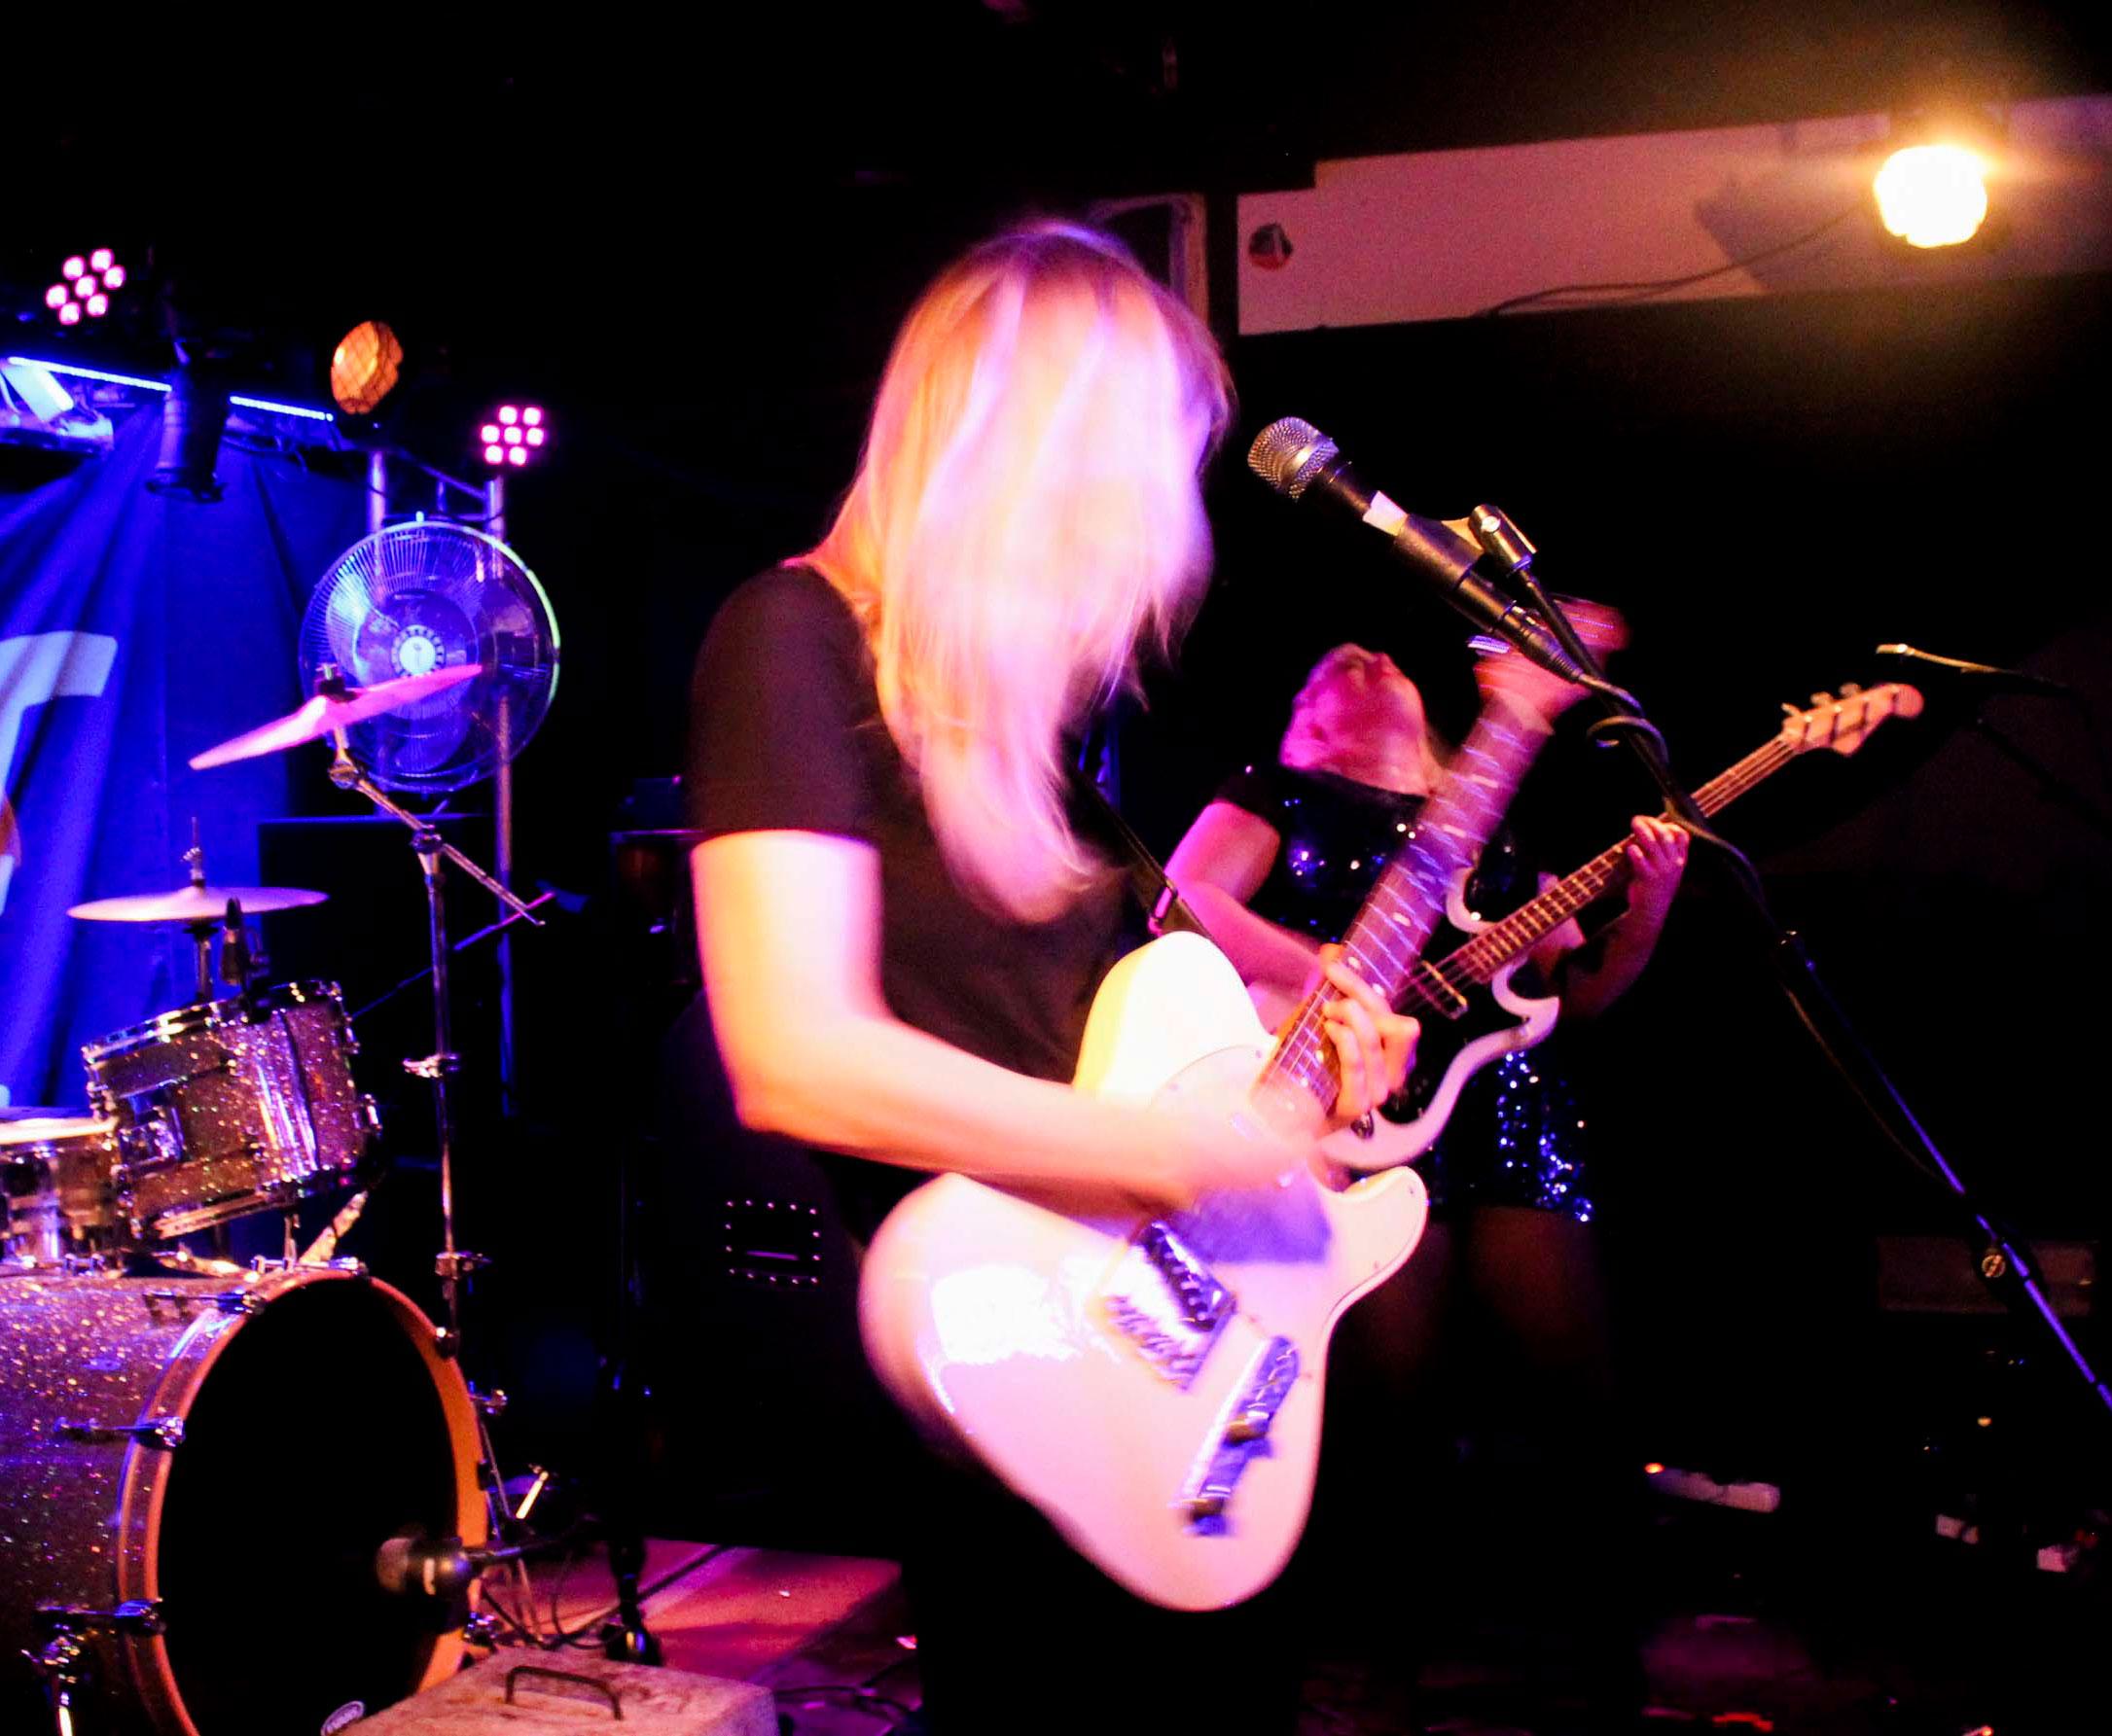 Livefoto - Band: Lava Bangs (foto: Edward Forslund)